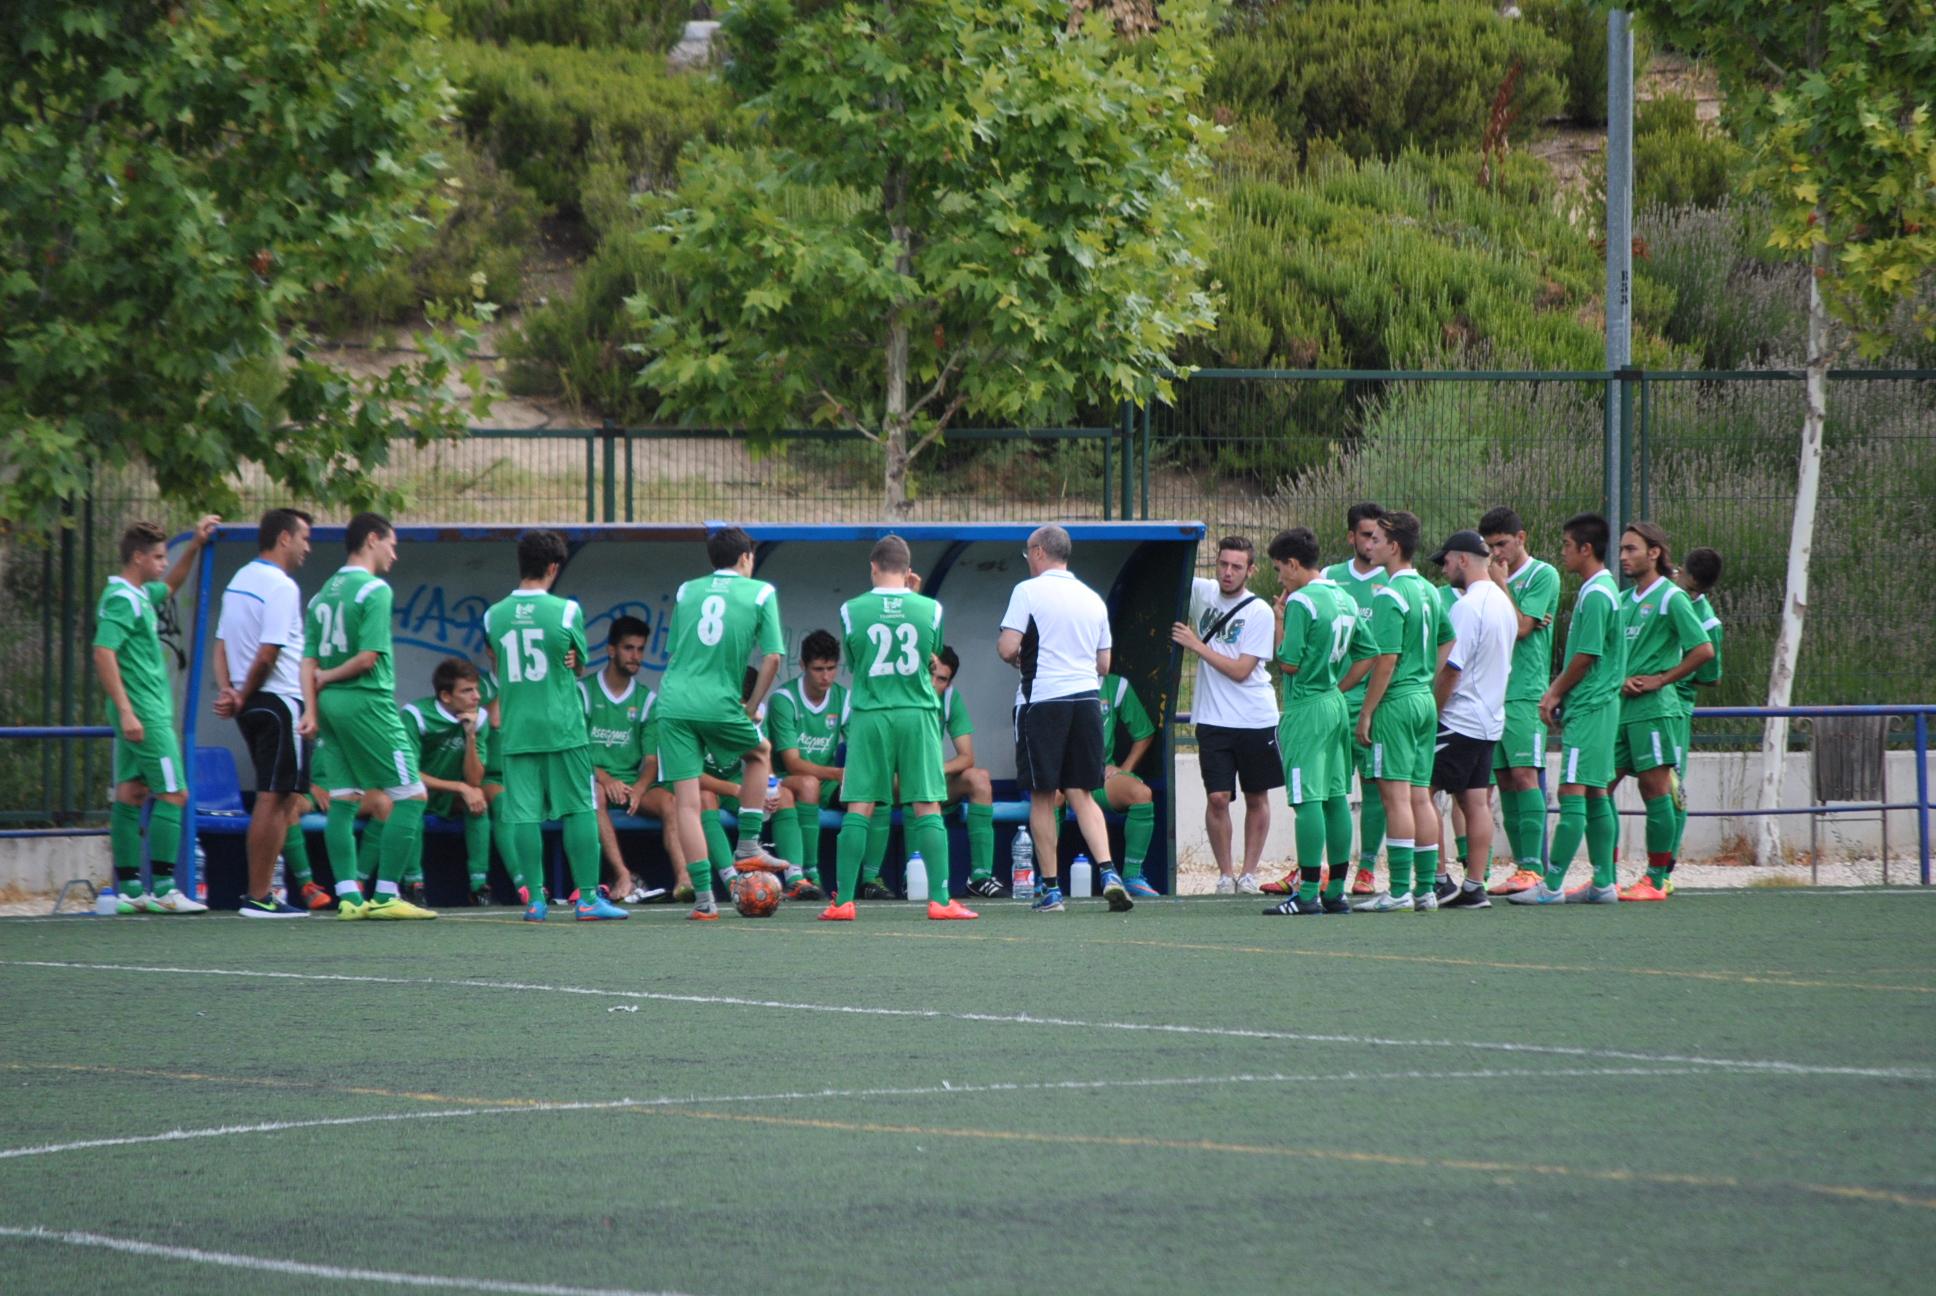 El Juvenil A disputa mañana la consolación del Madrid Youth Cup